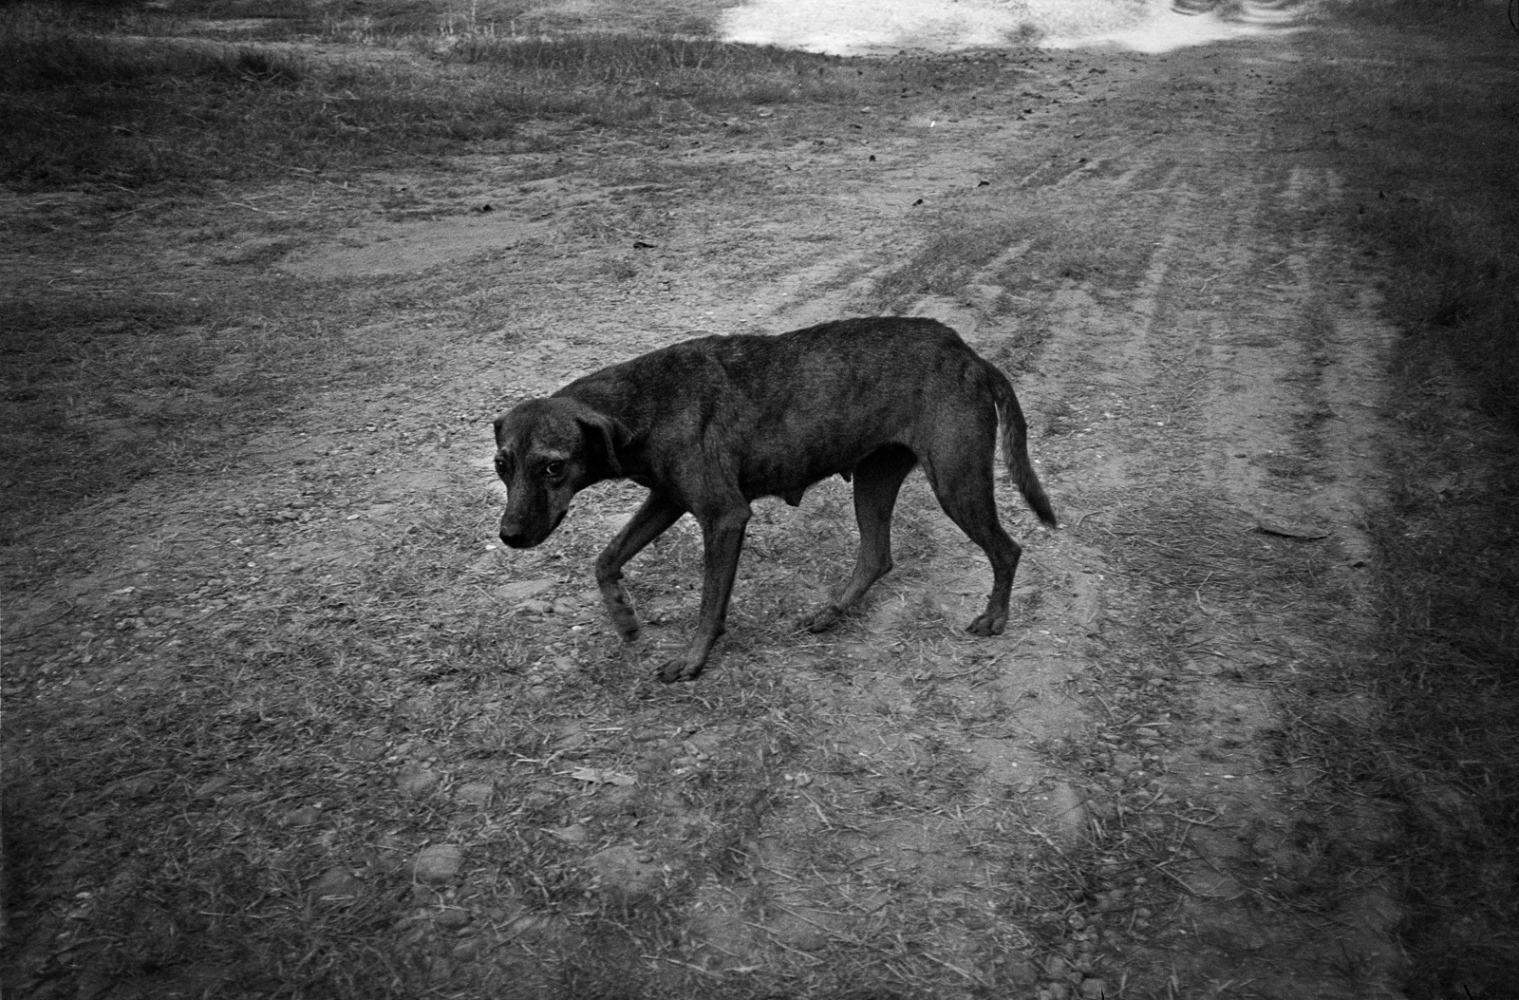 Art and Documentary Photography - Loading ElPerro__Ozuluama__sdeswaan.jpg